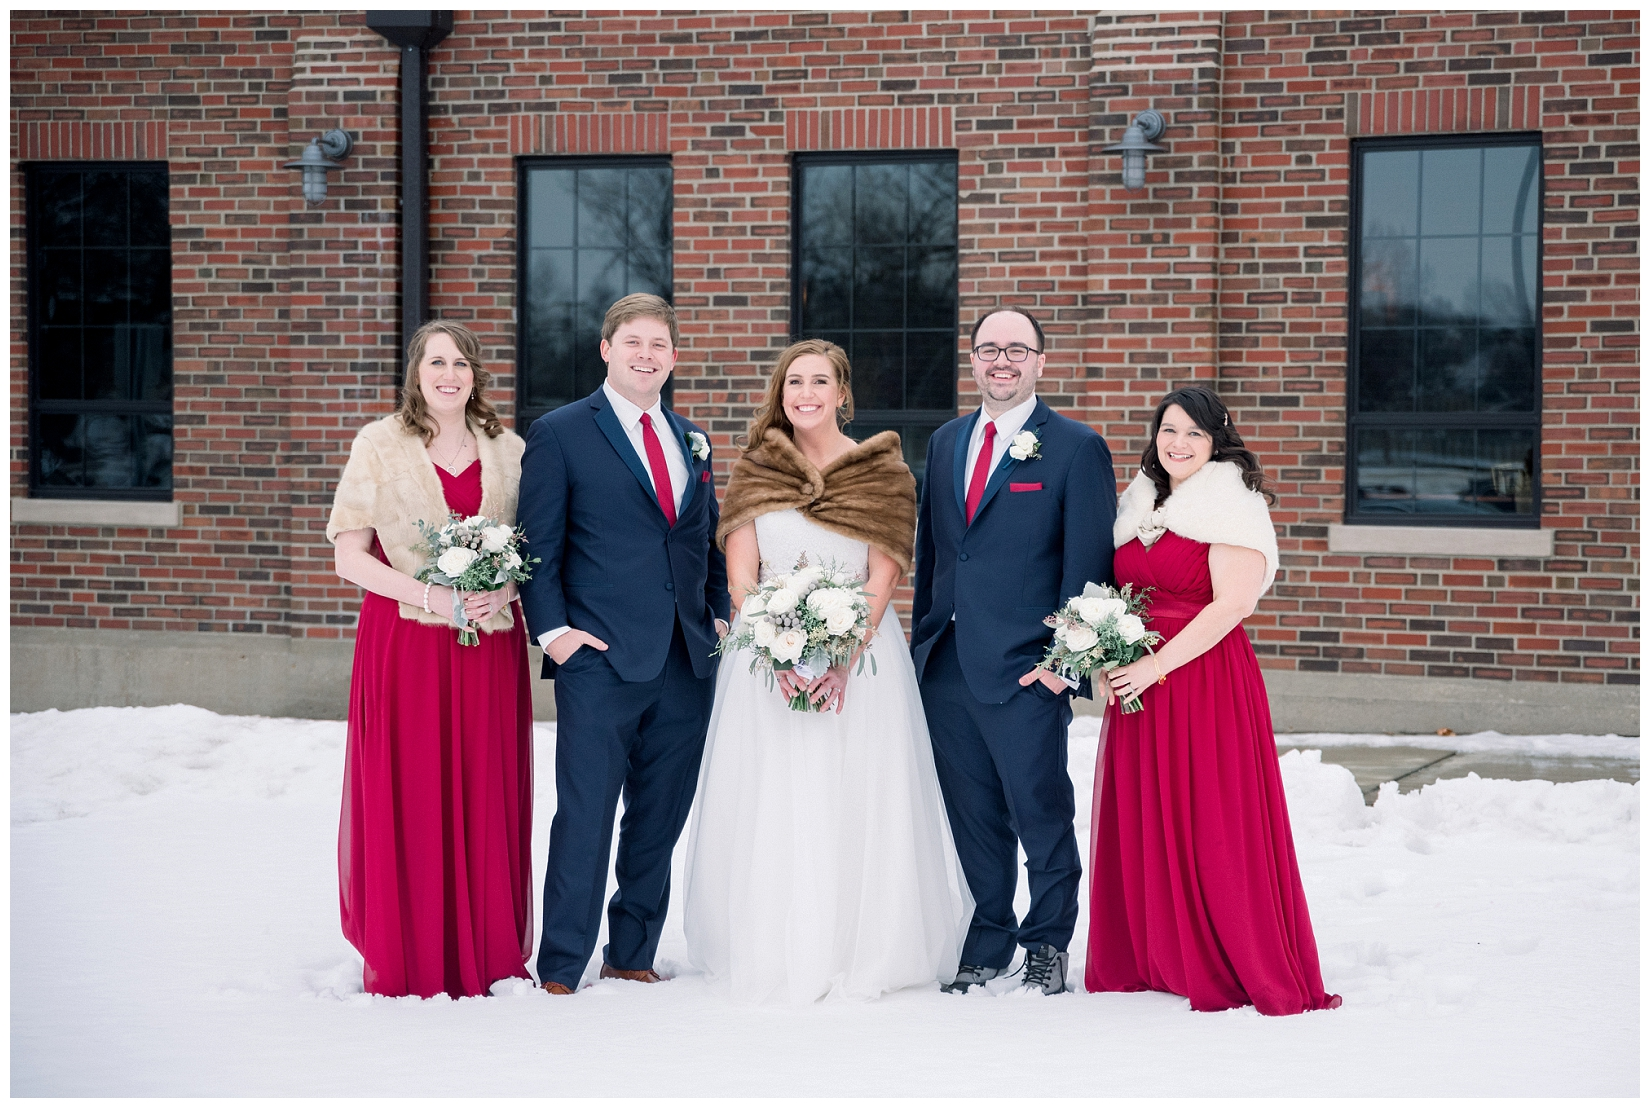 cat-alkire-wedding-photographer-indiana-chicago-indianapolis-fort-wayne_0955.jpg